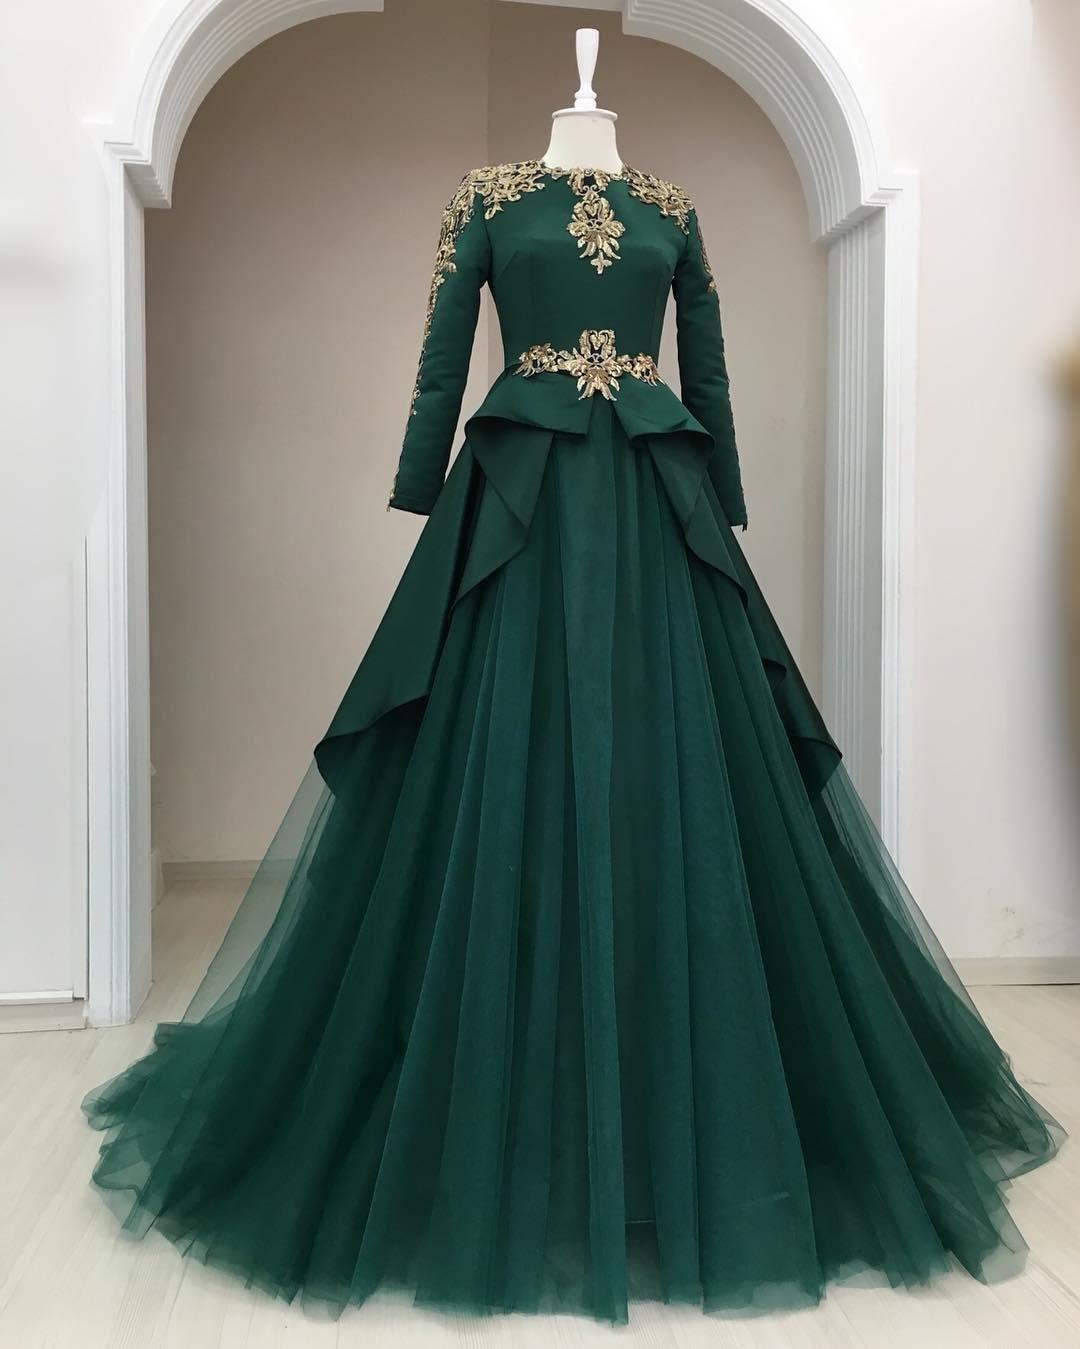 Şatafat seelikepin pinterest gowns kebaya and muslim